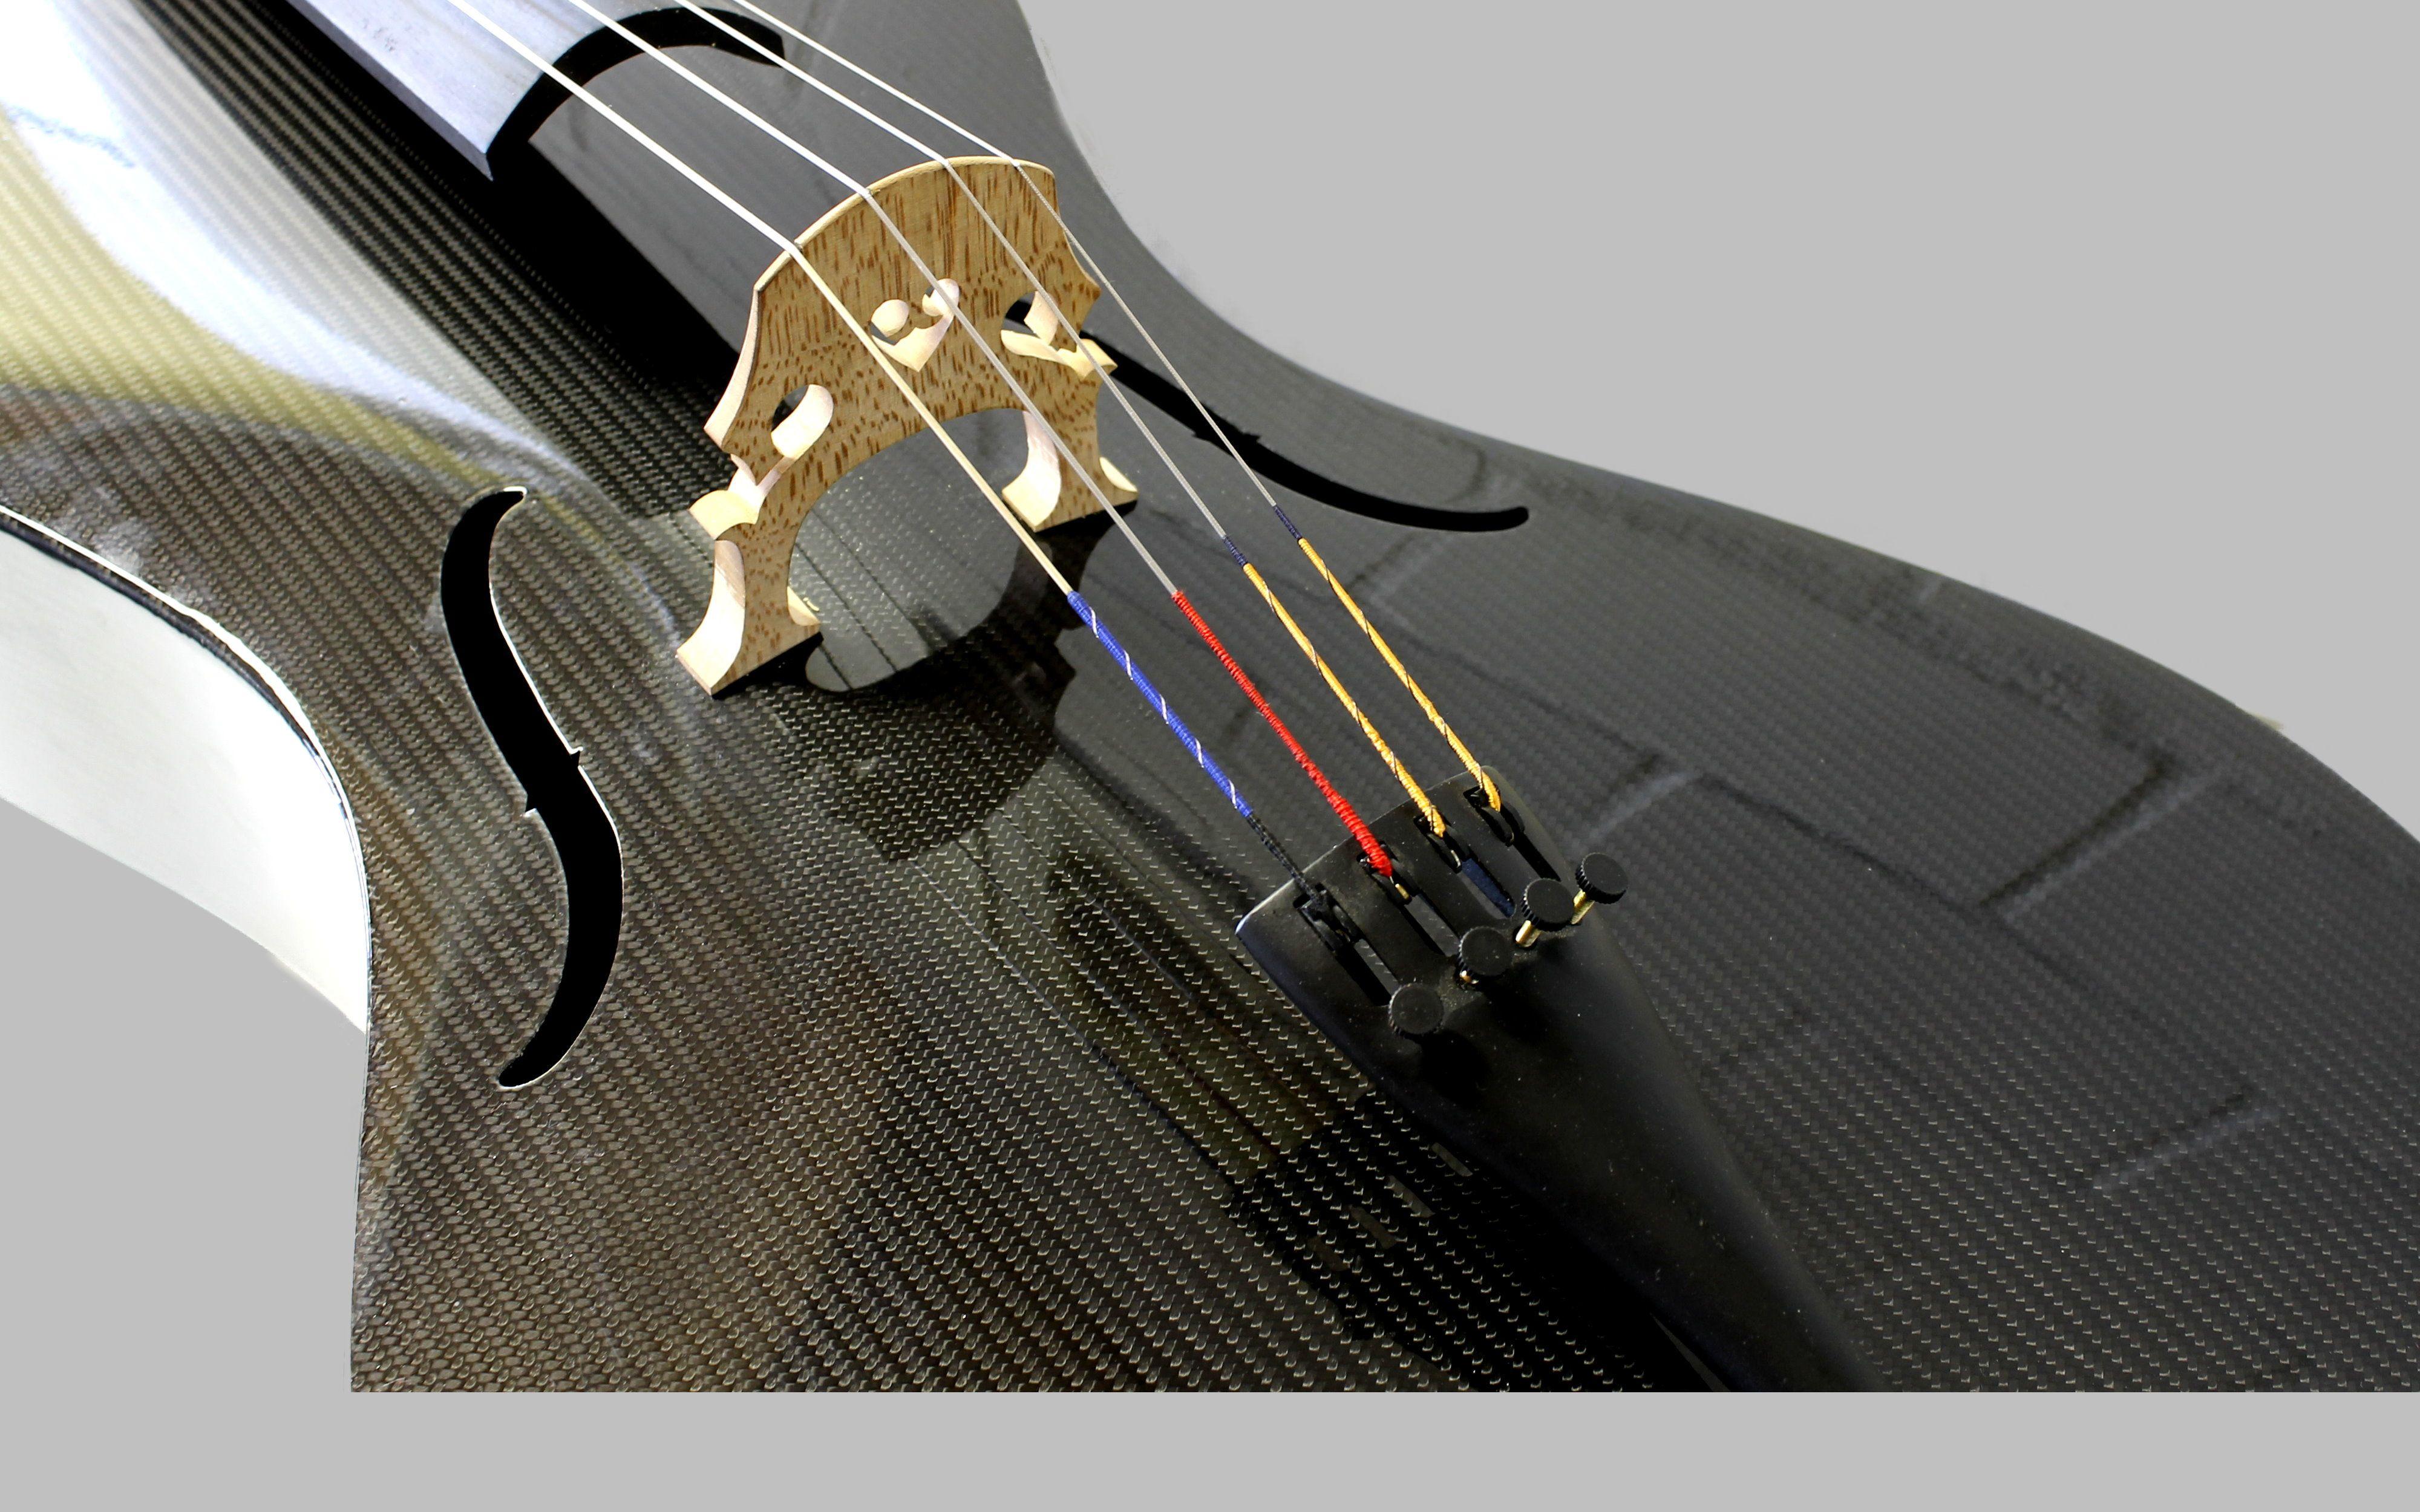 Luis & Clark Carbon Fiber Cello